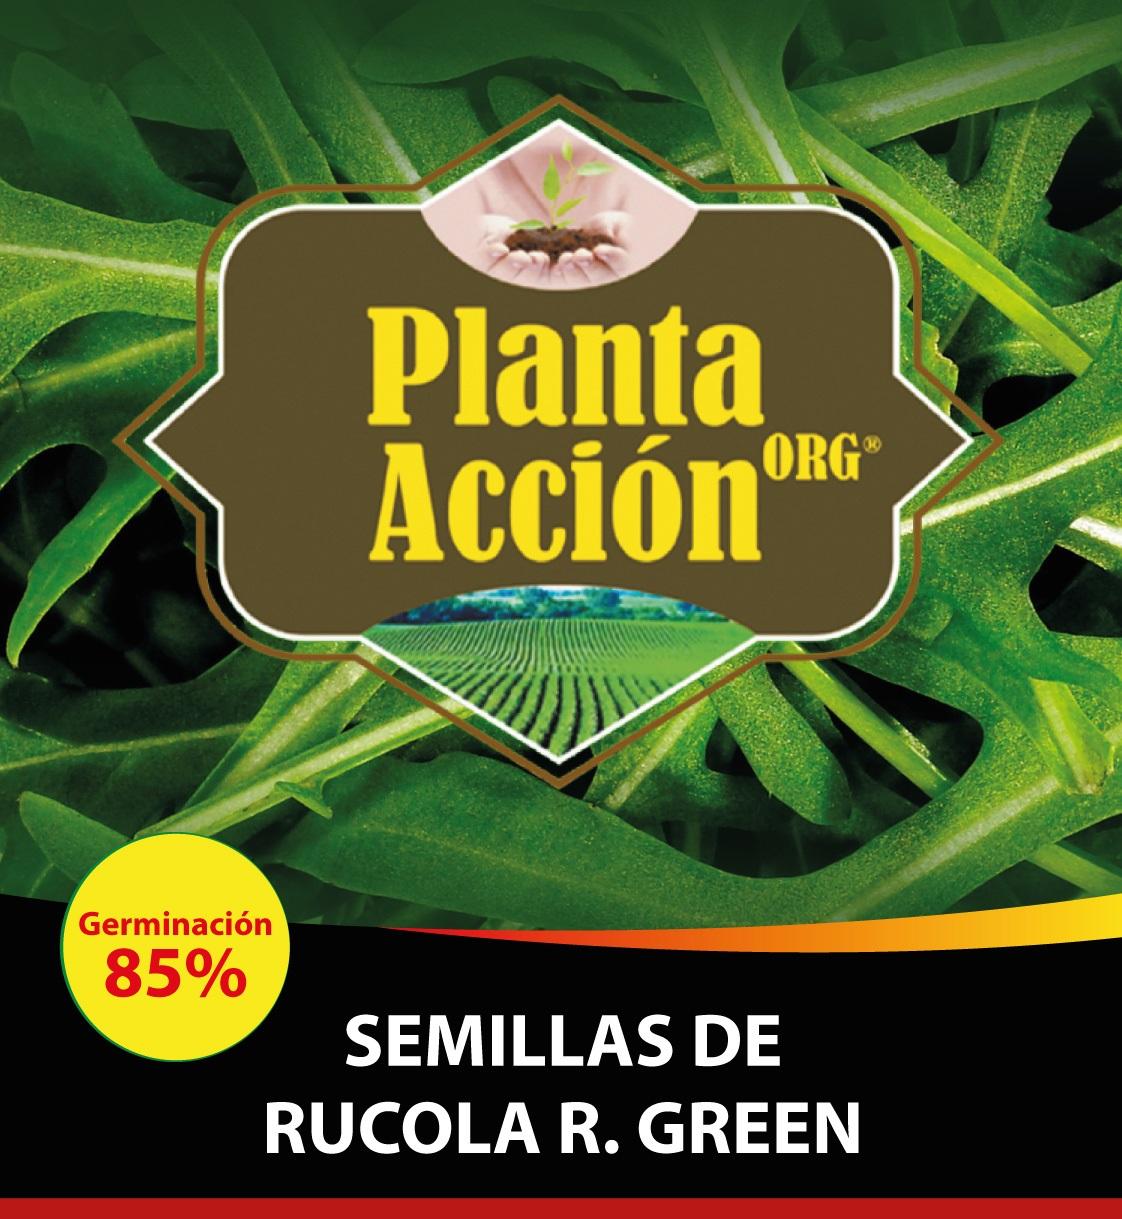 SEMILLAS DE RUCOLA R. GREEN